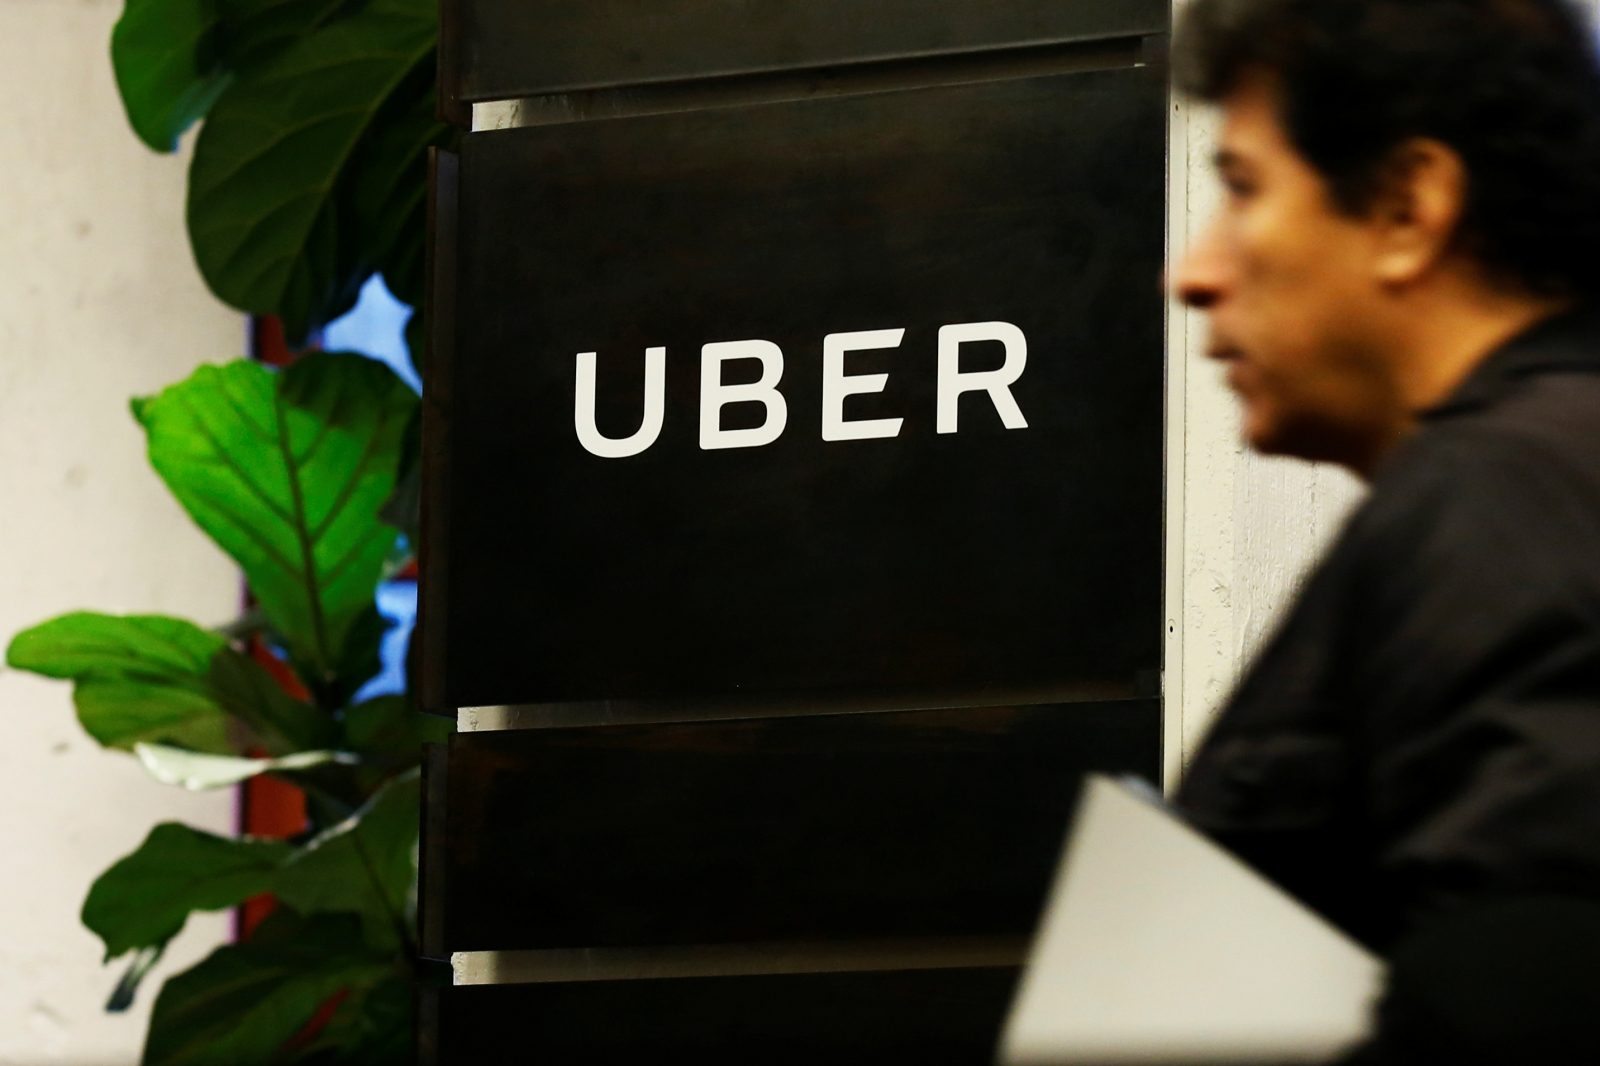 uber - photo #19